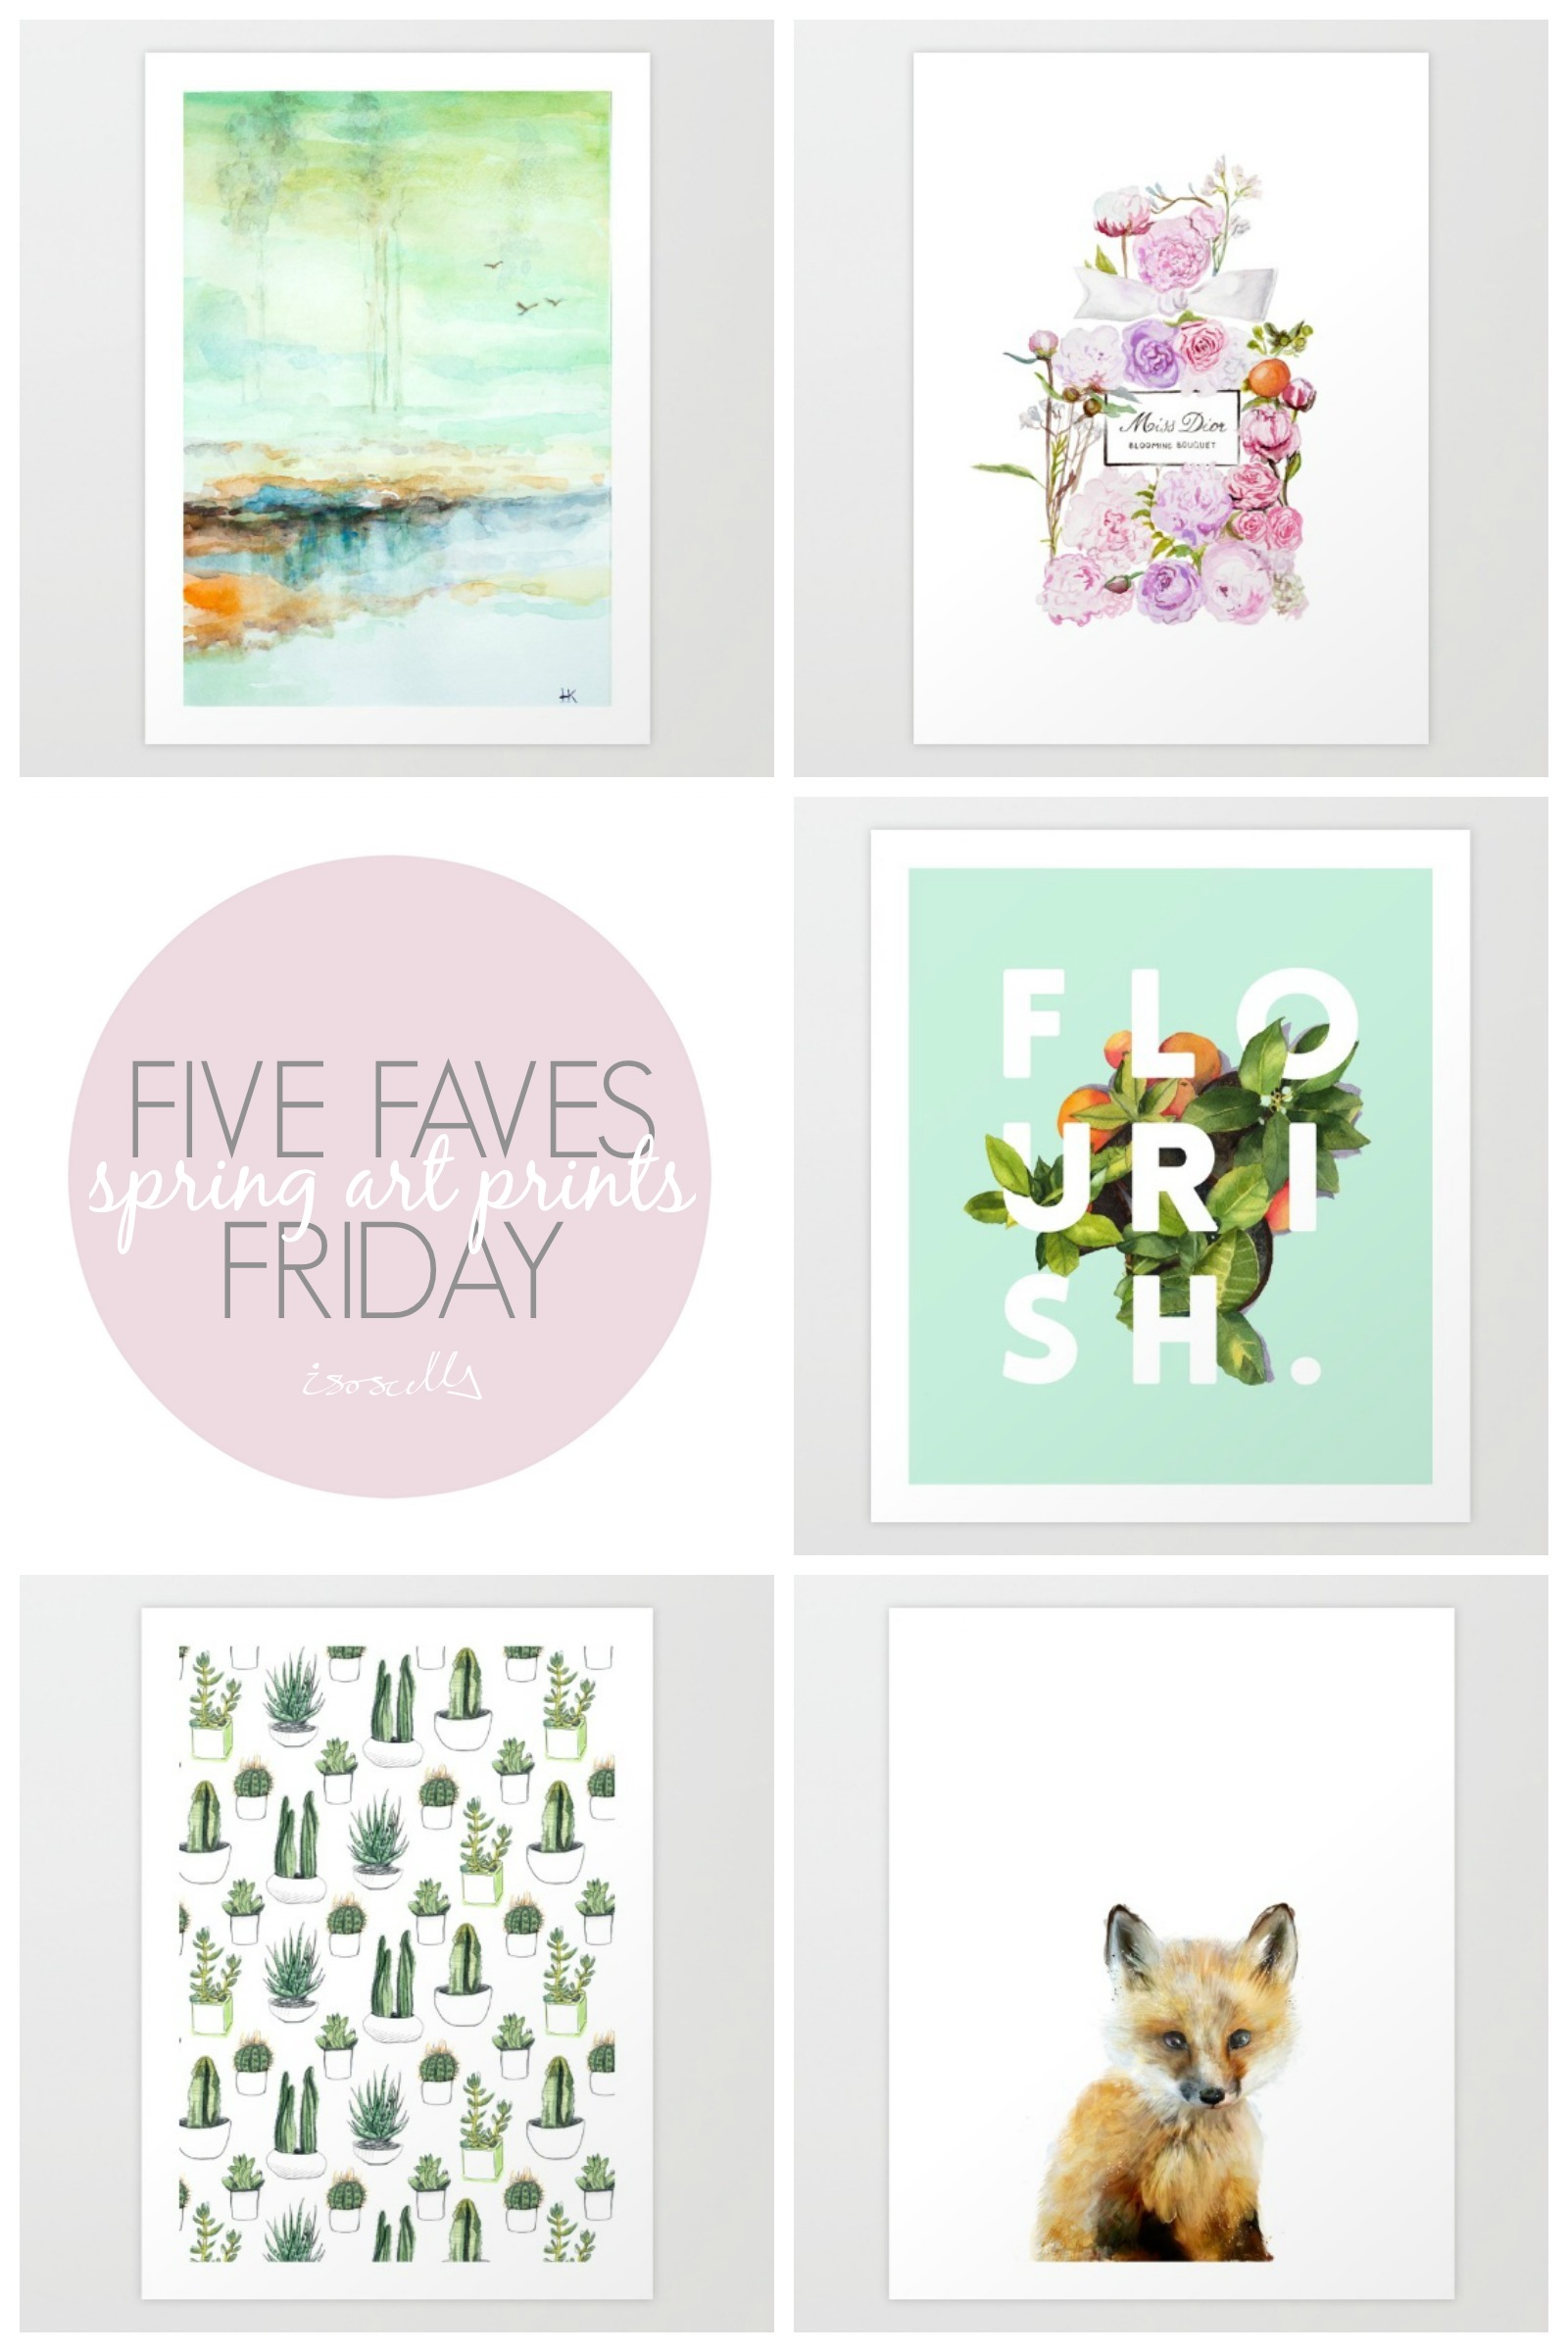 Five Faves Friday // Spring Art Prints - Isoscella